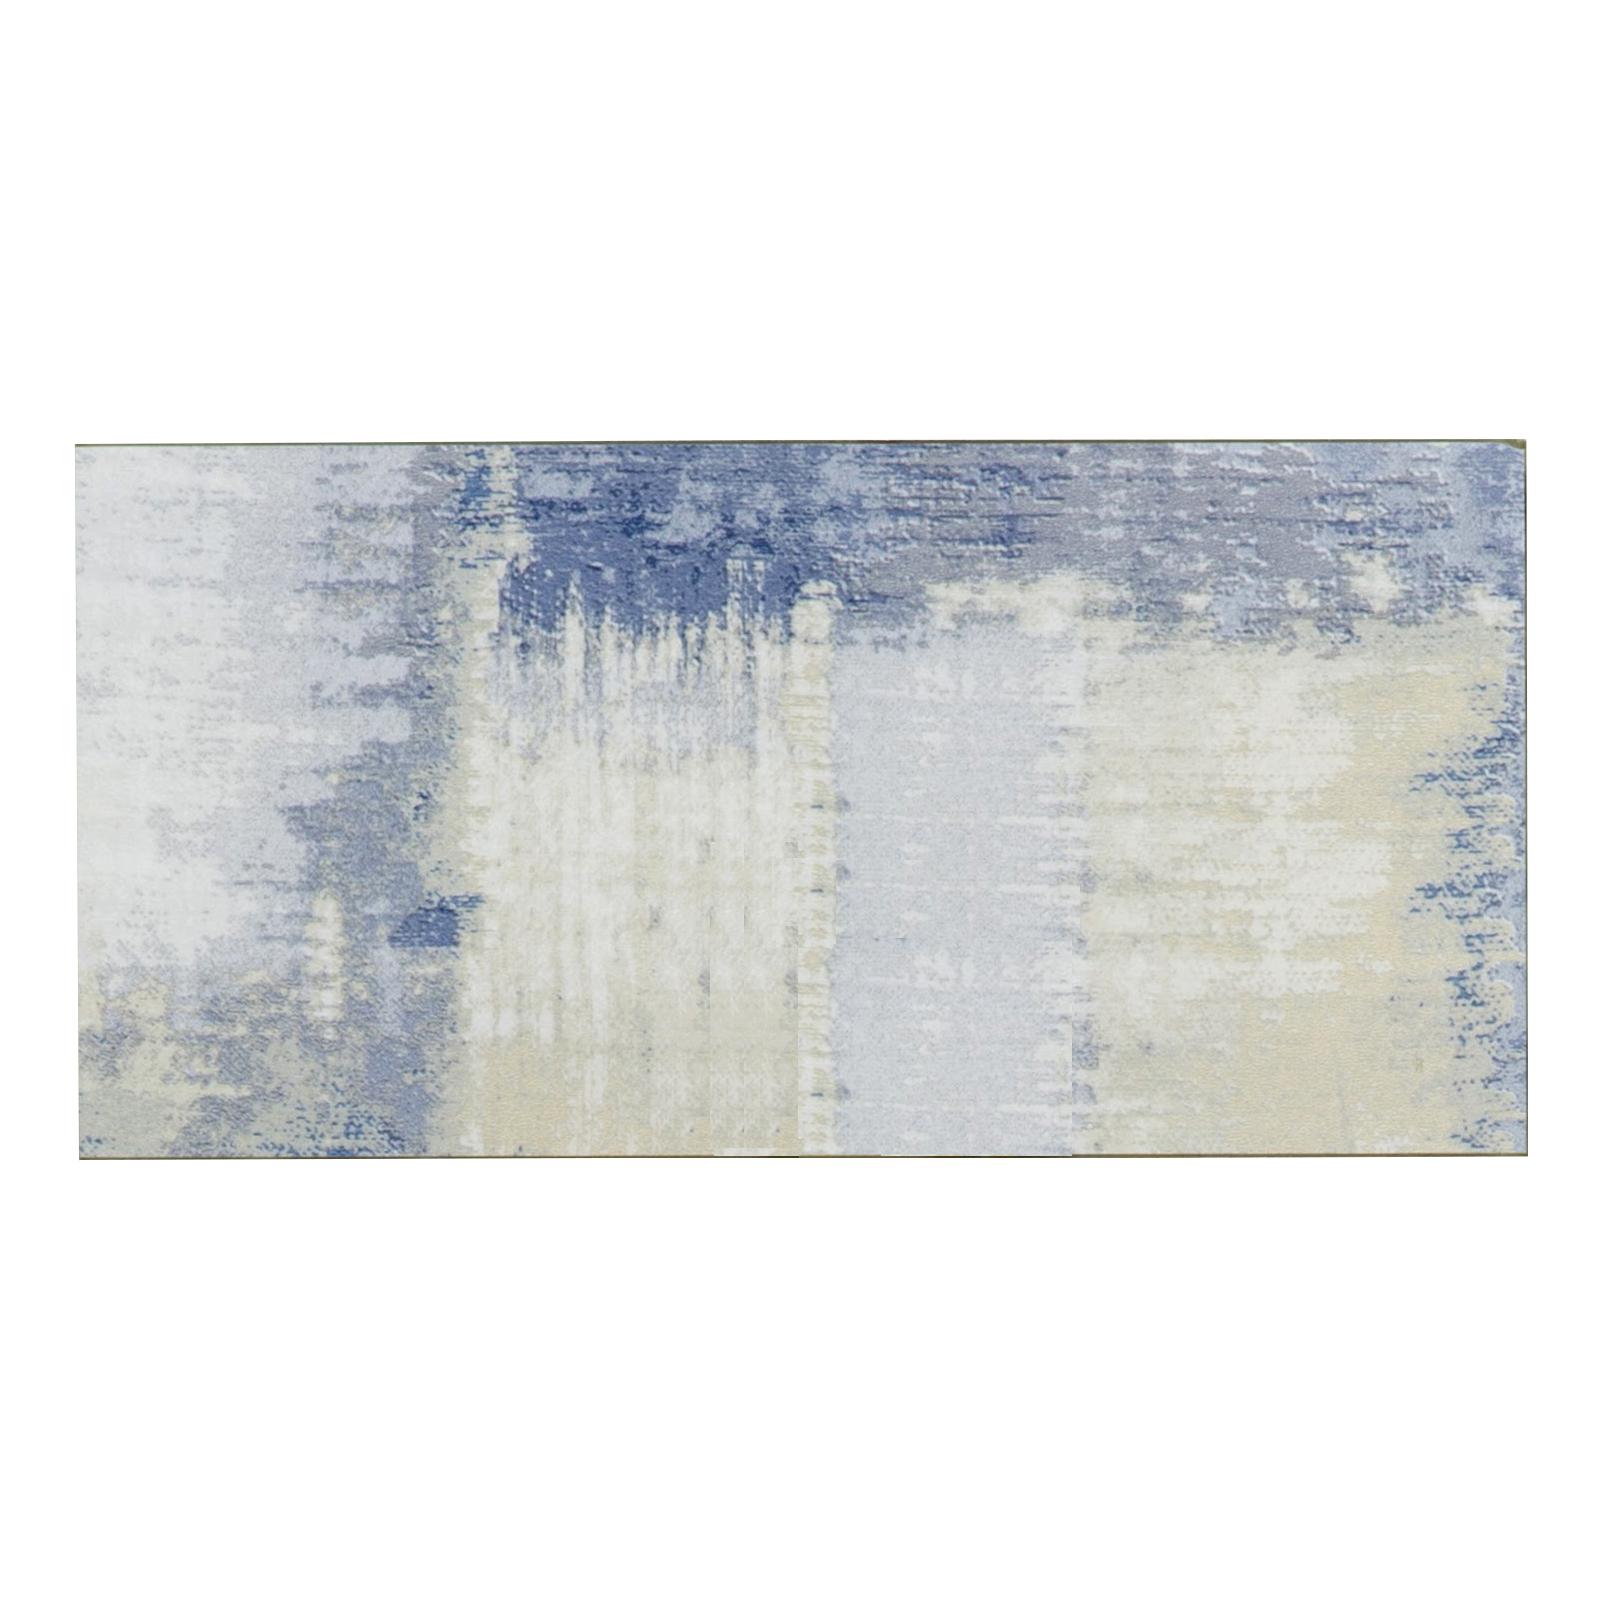 "Abolos- Nature Straight Edge 4"" x 8"" Glass Subway Backsplash Tile in Cement Blue/Tan/Gray (16sqft / 80pc Box)"